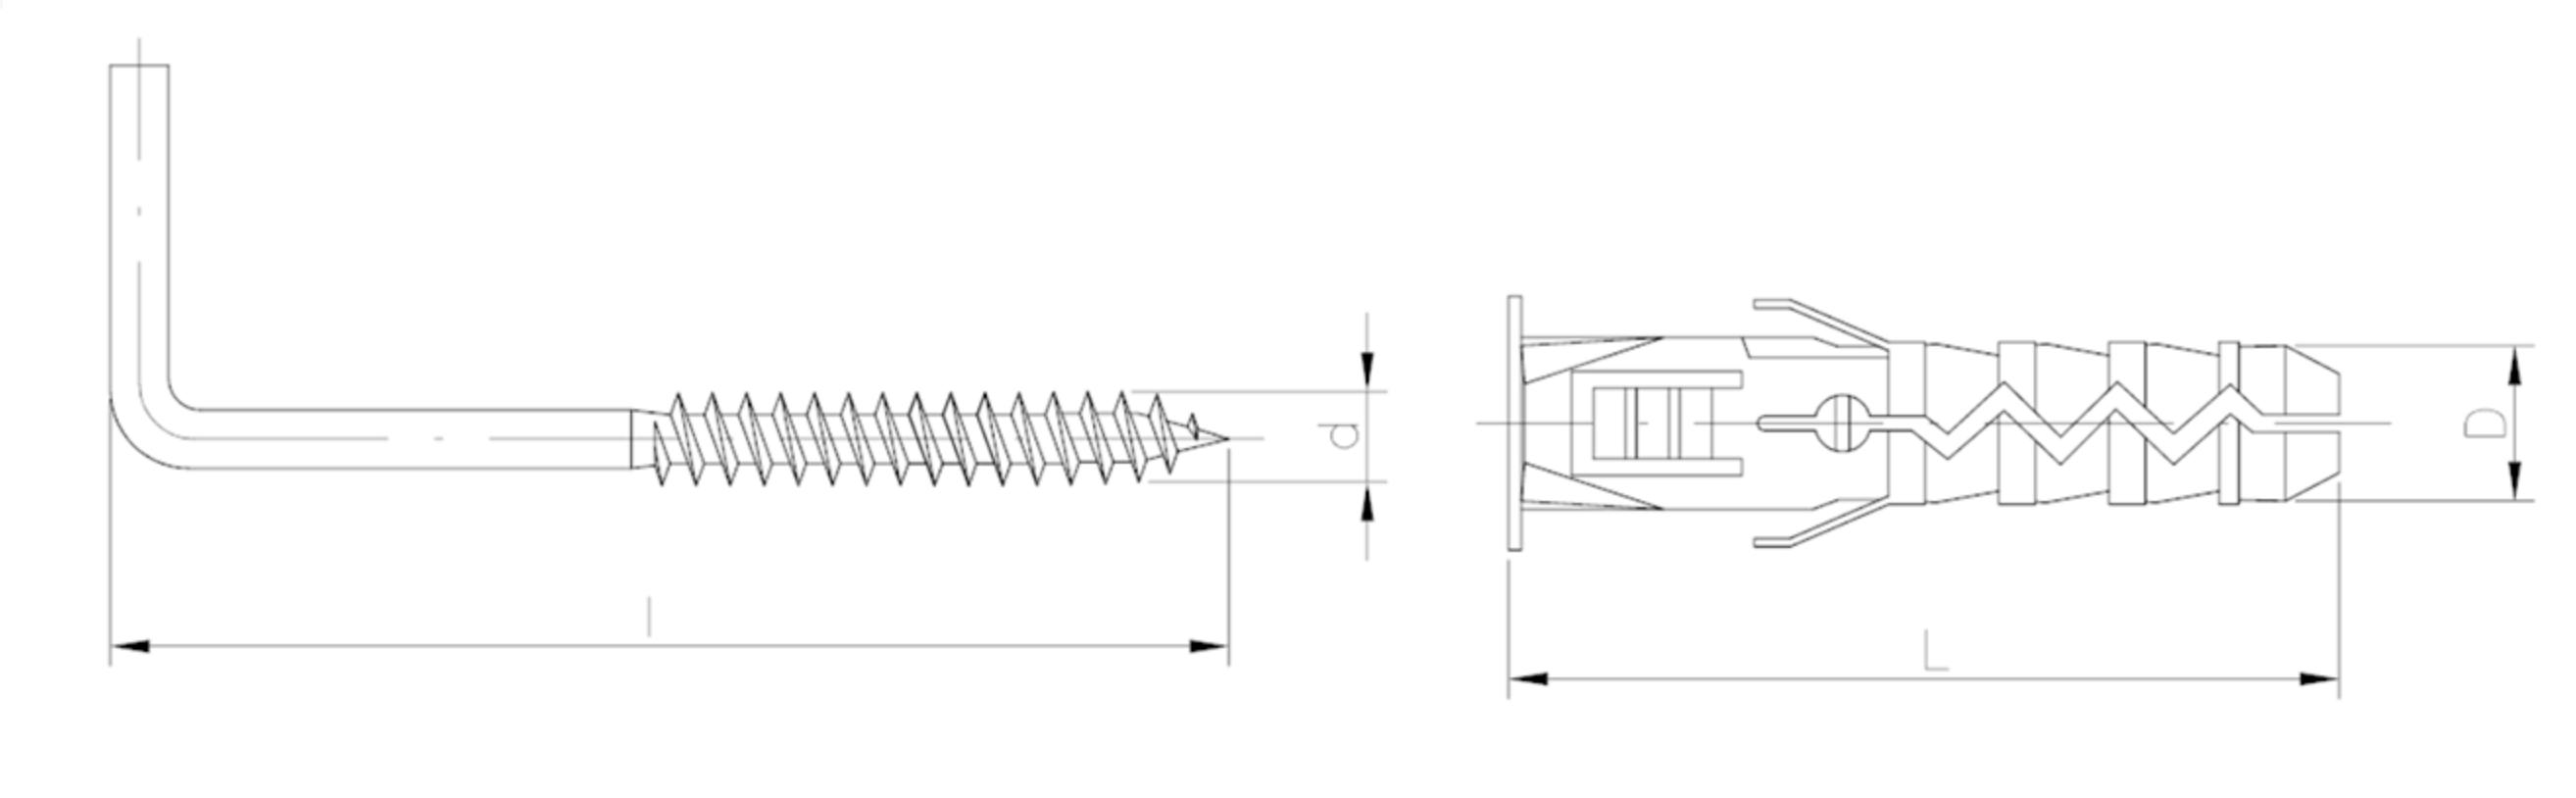 Ceiling Hook  Cavity Wall Heavy Duty Fixings Plugs Universal Nylon Wall Plugs